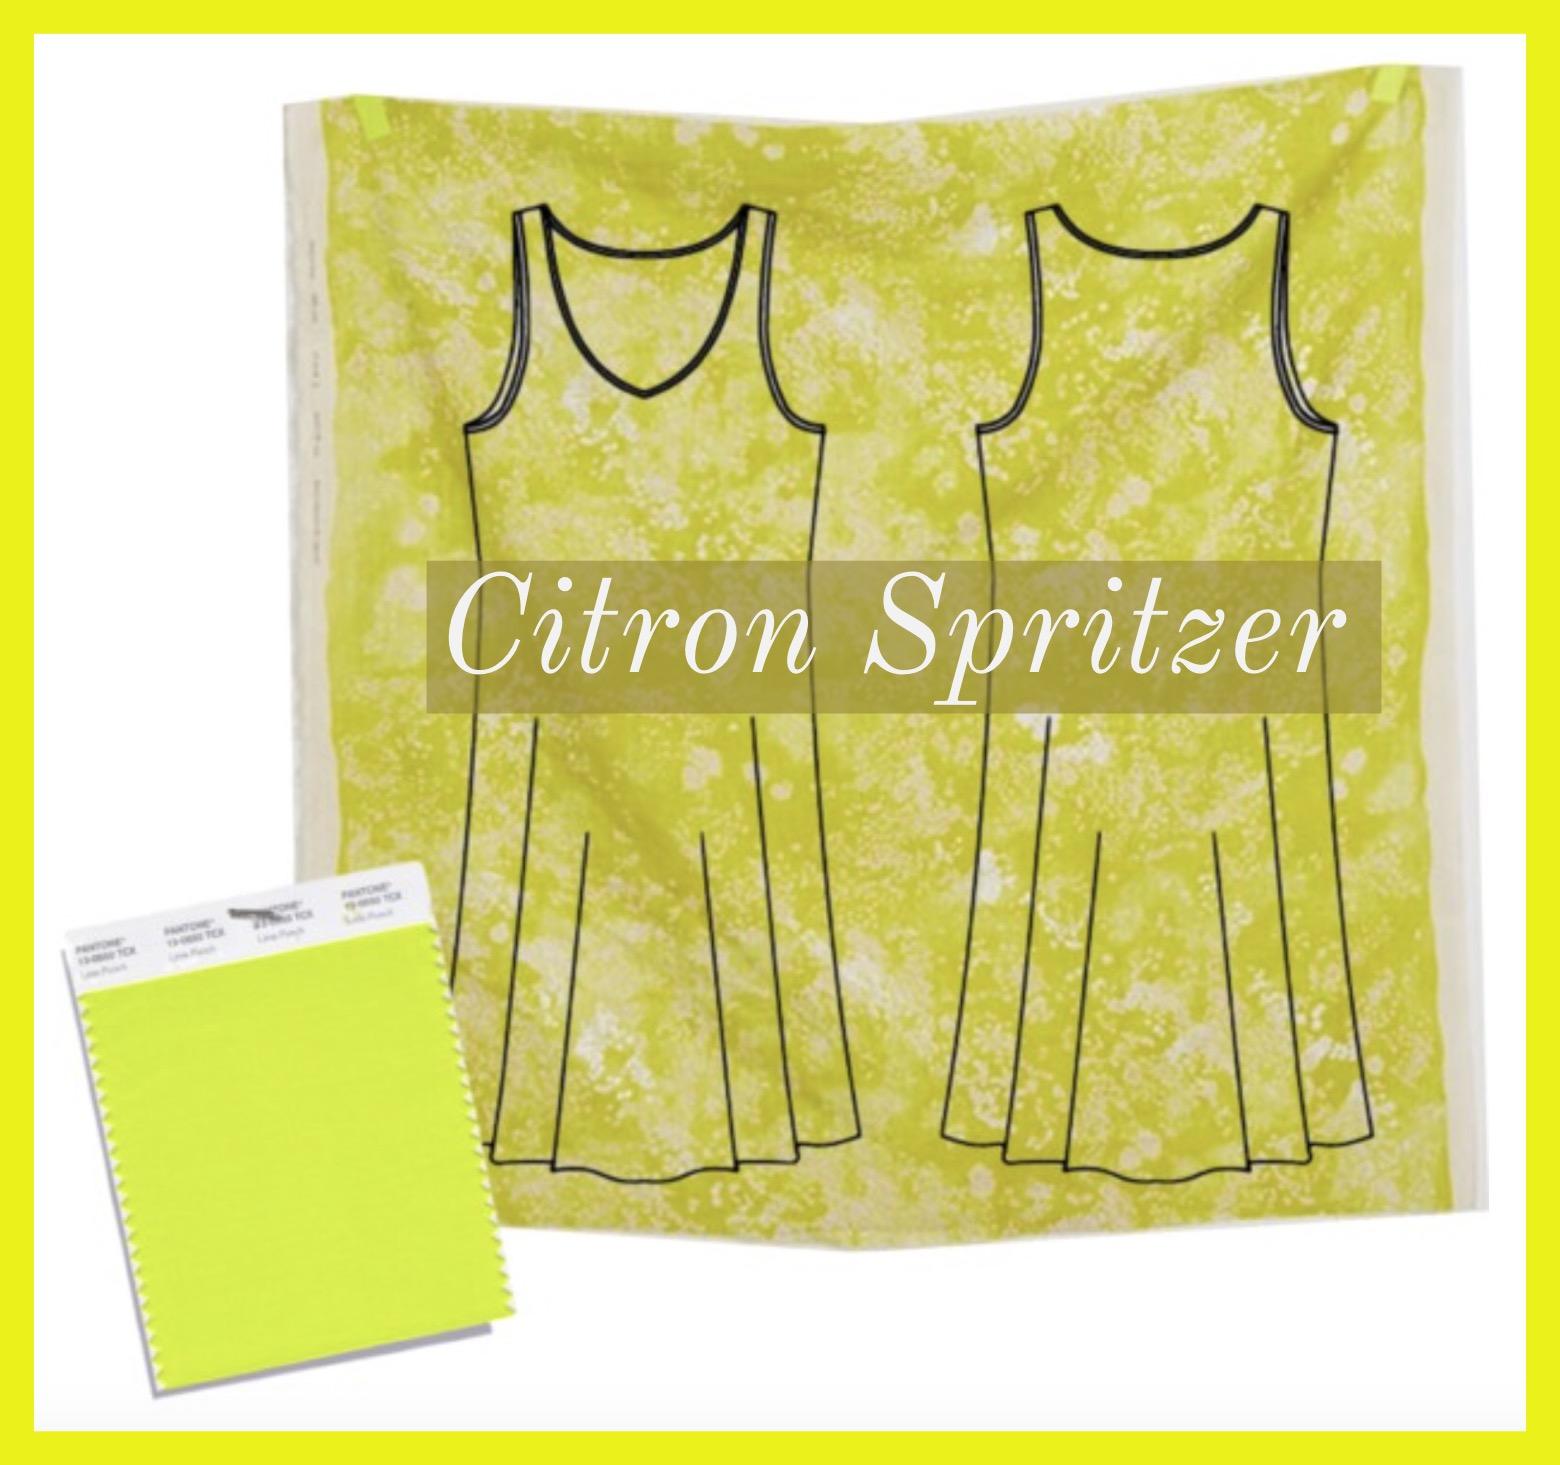 The  Ann Normandy Design Slip Dress Sewing Pattern  with fabric suggestion, Lei Nani, from Nani Iro's fabric collection, at Harts Fabrics.